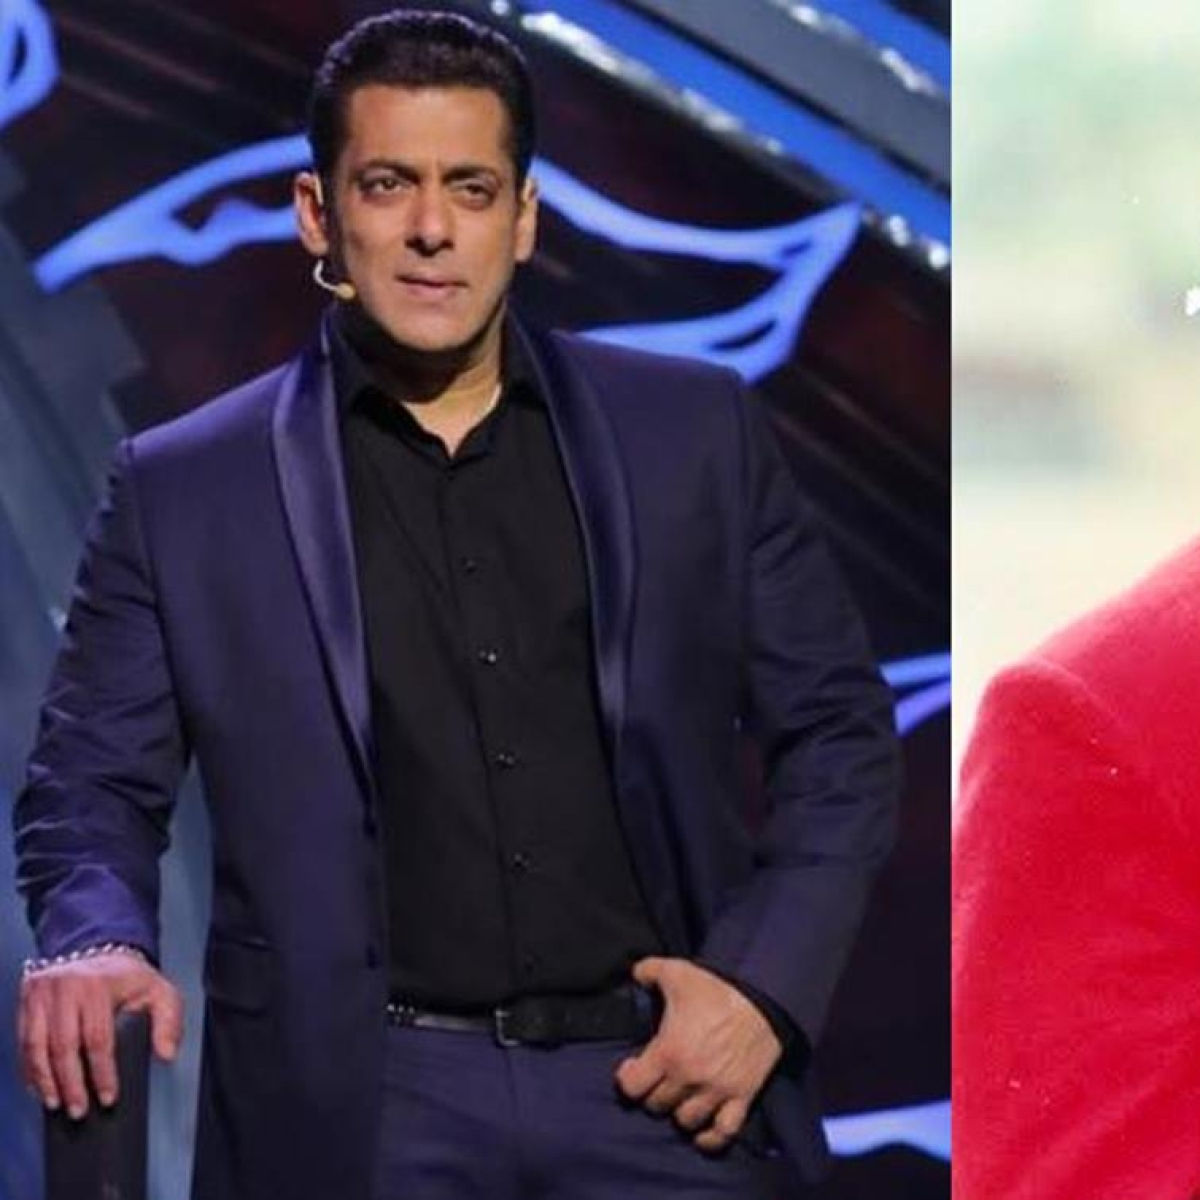 Salman Khan pays Faraaz Khan's medical bills after ailing actor battles for life in ICU